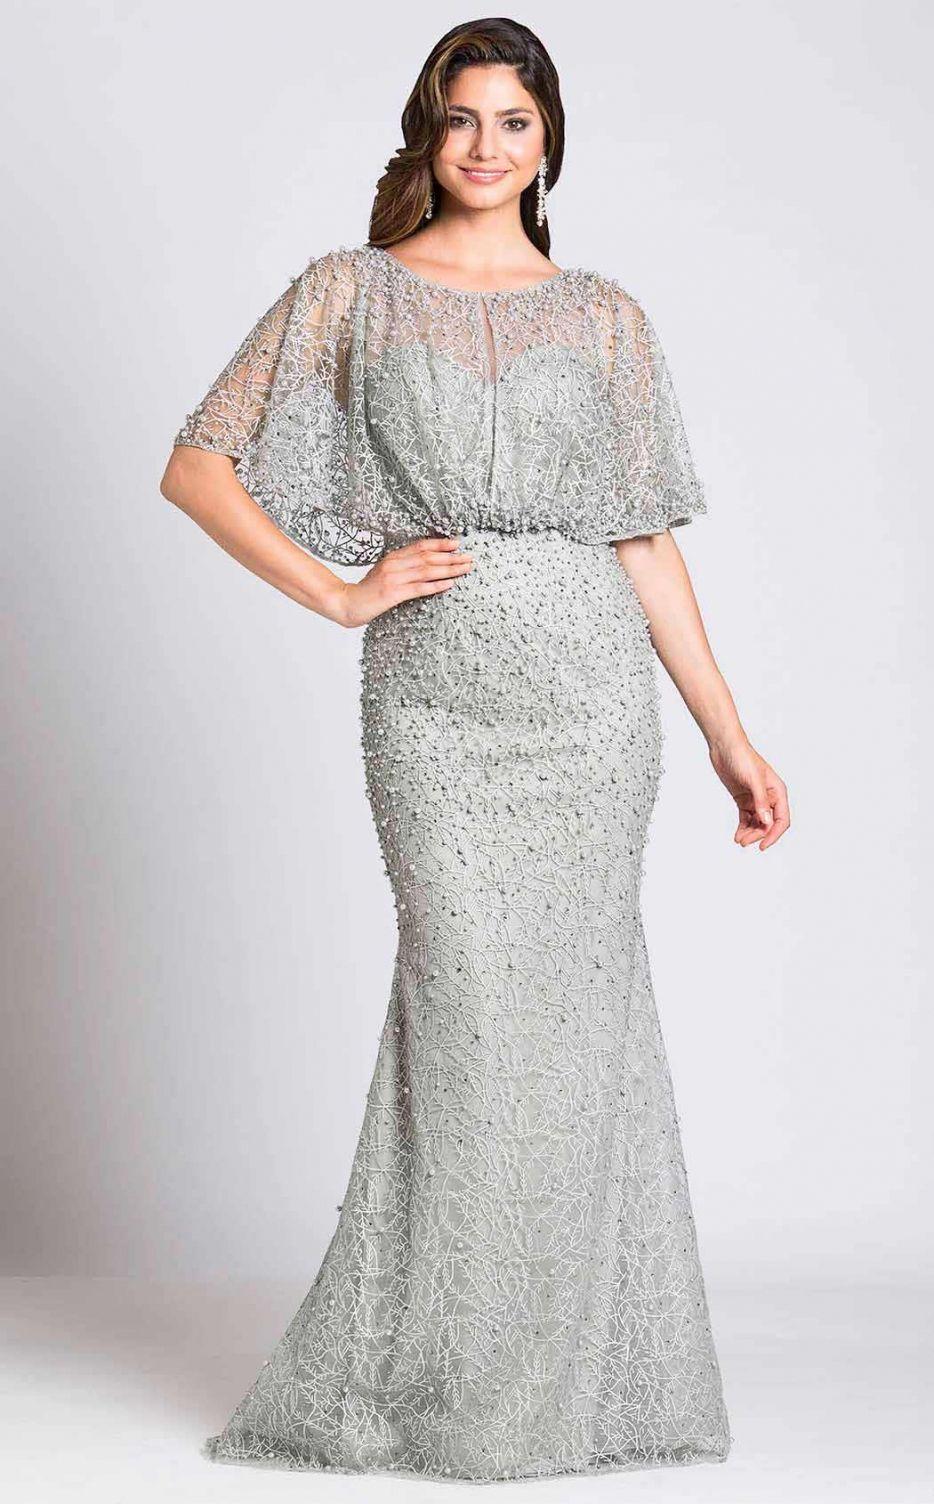 New York Wedding Guest Dresses - Women\'s Dresses for Weddings Check ...